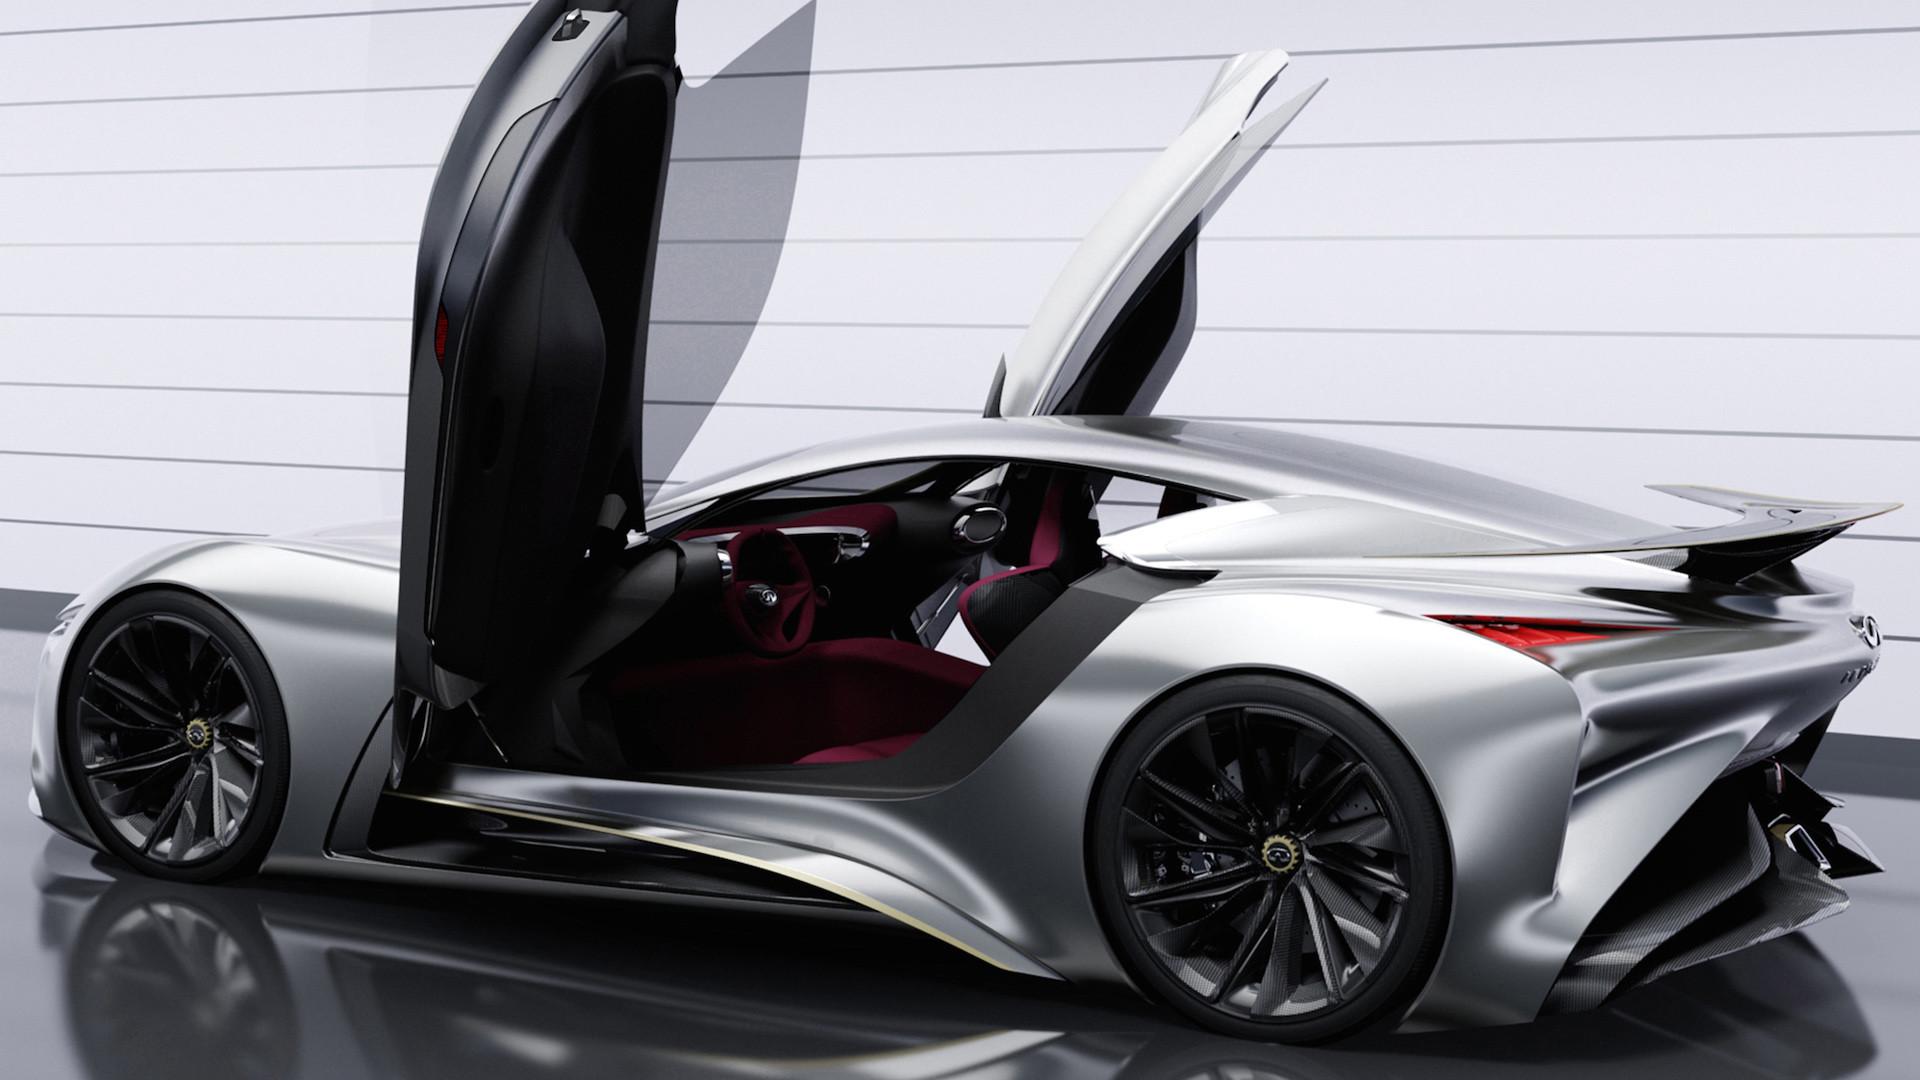 Infiniti Concept Vision Gran Turismo 2